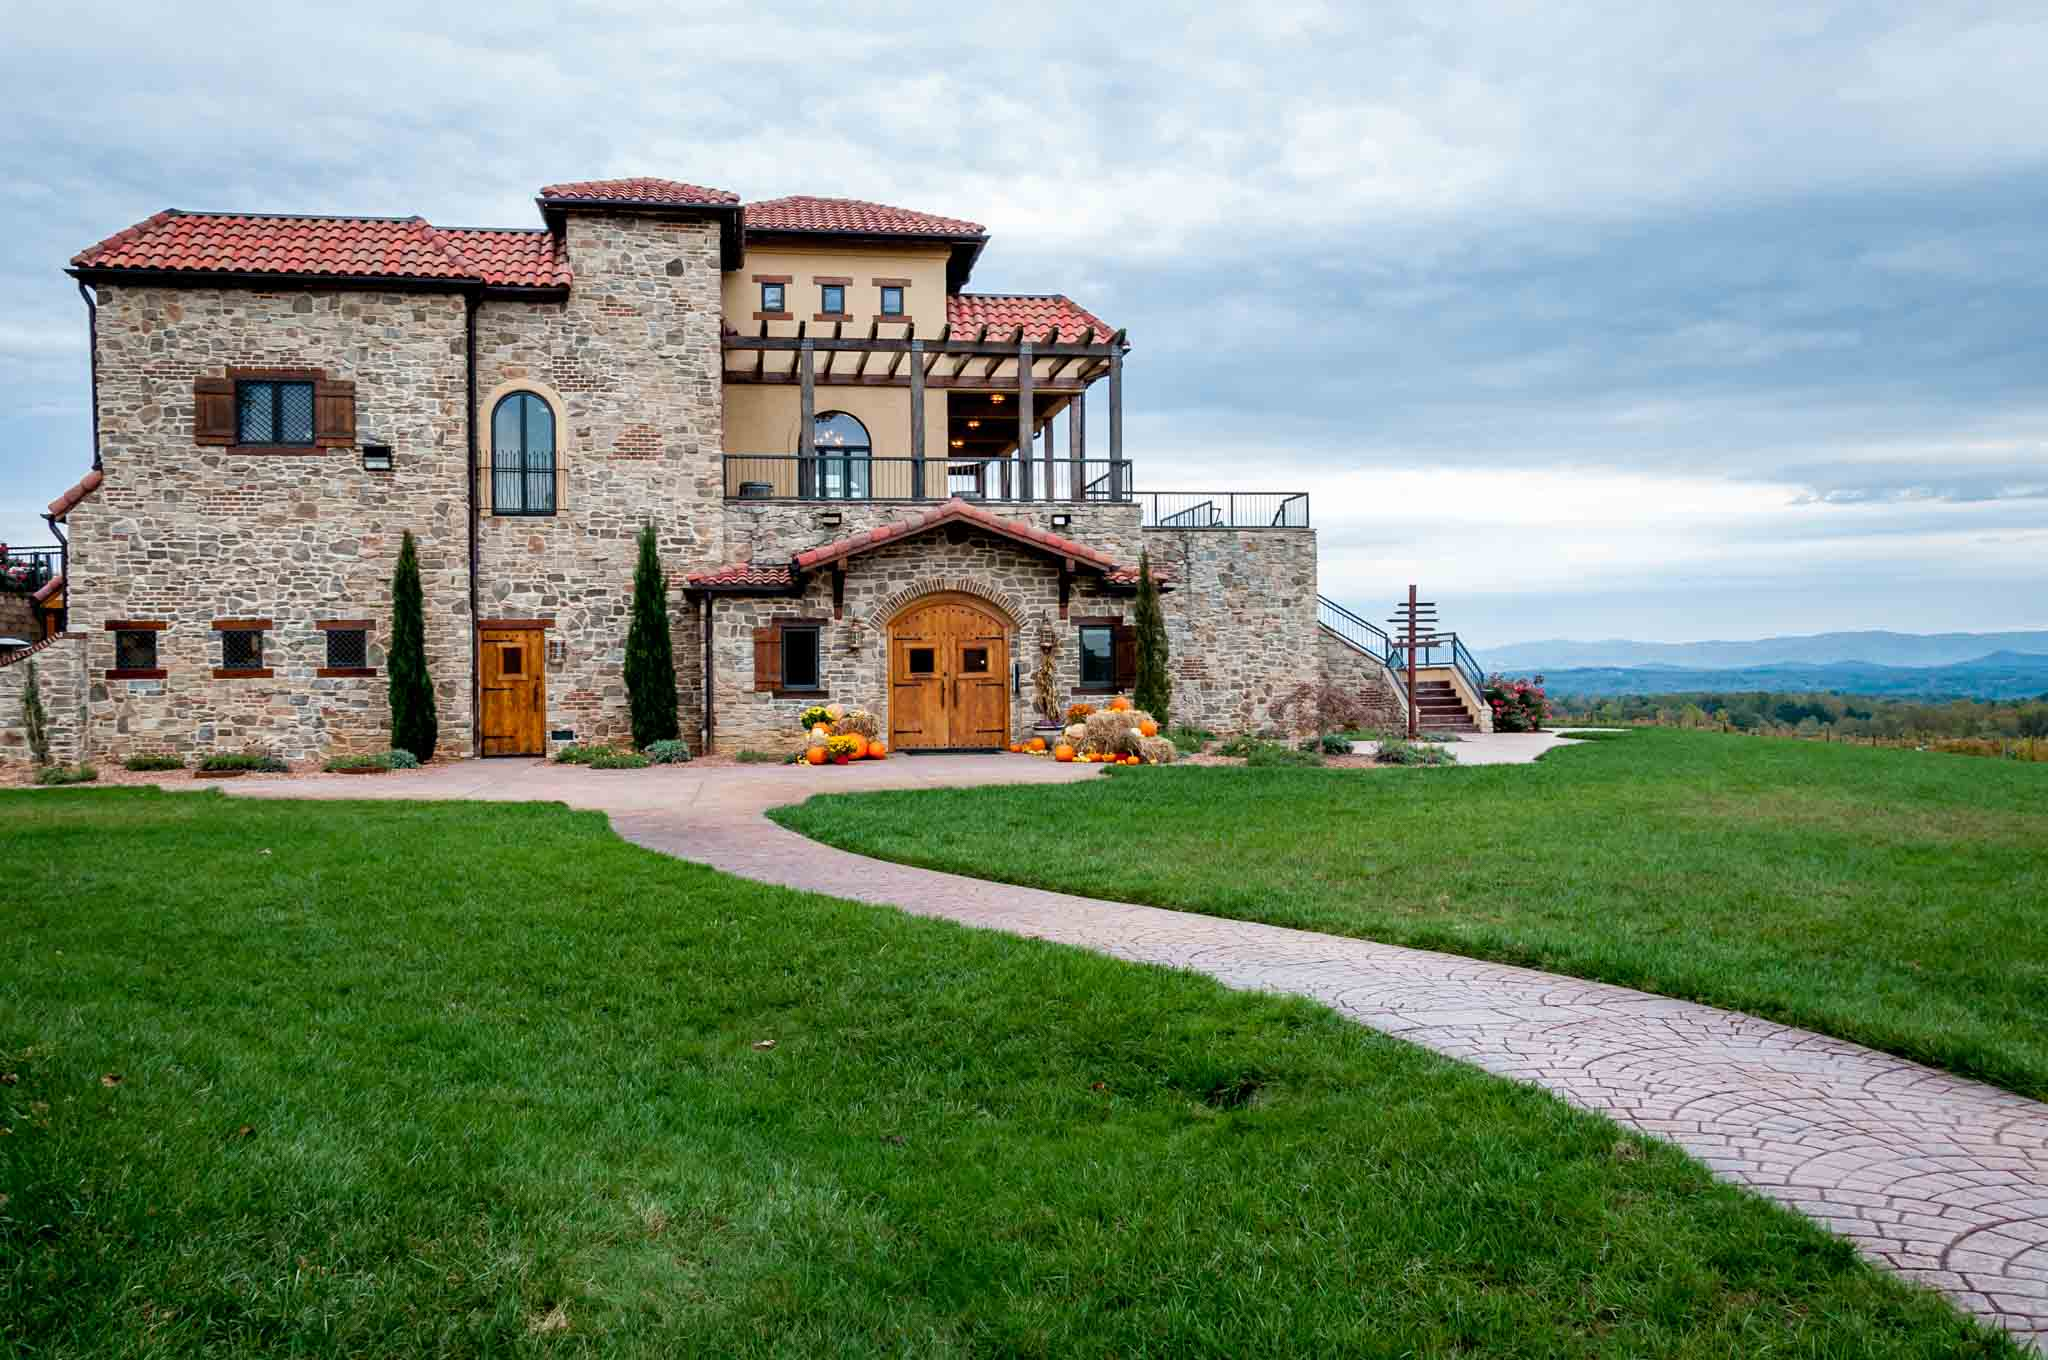 Raffaldini Vineyards is one of the largest Yadkin Valley wineries